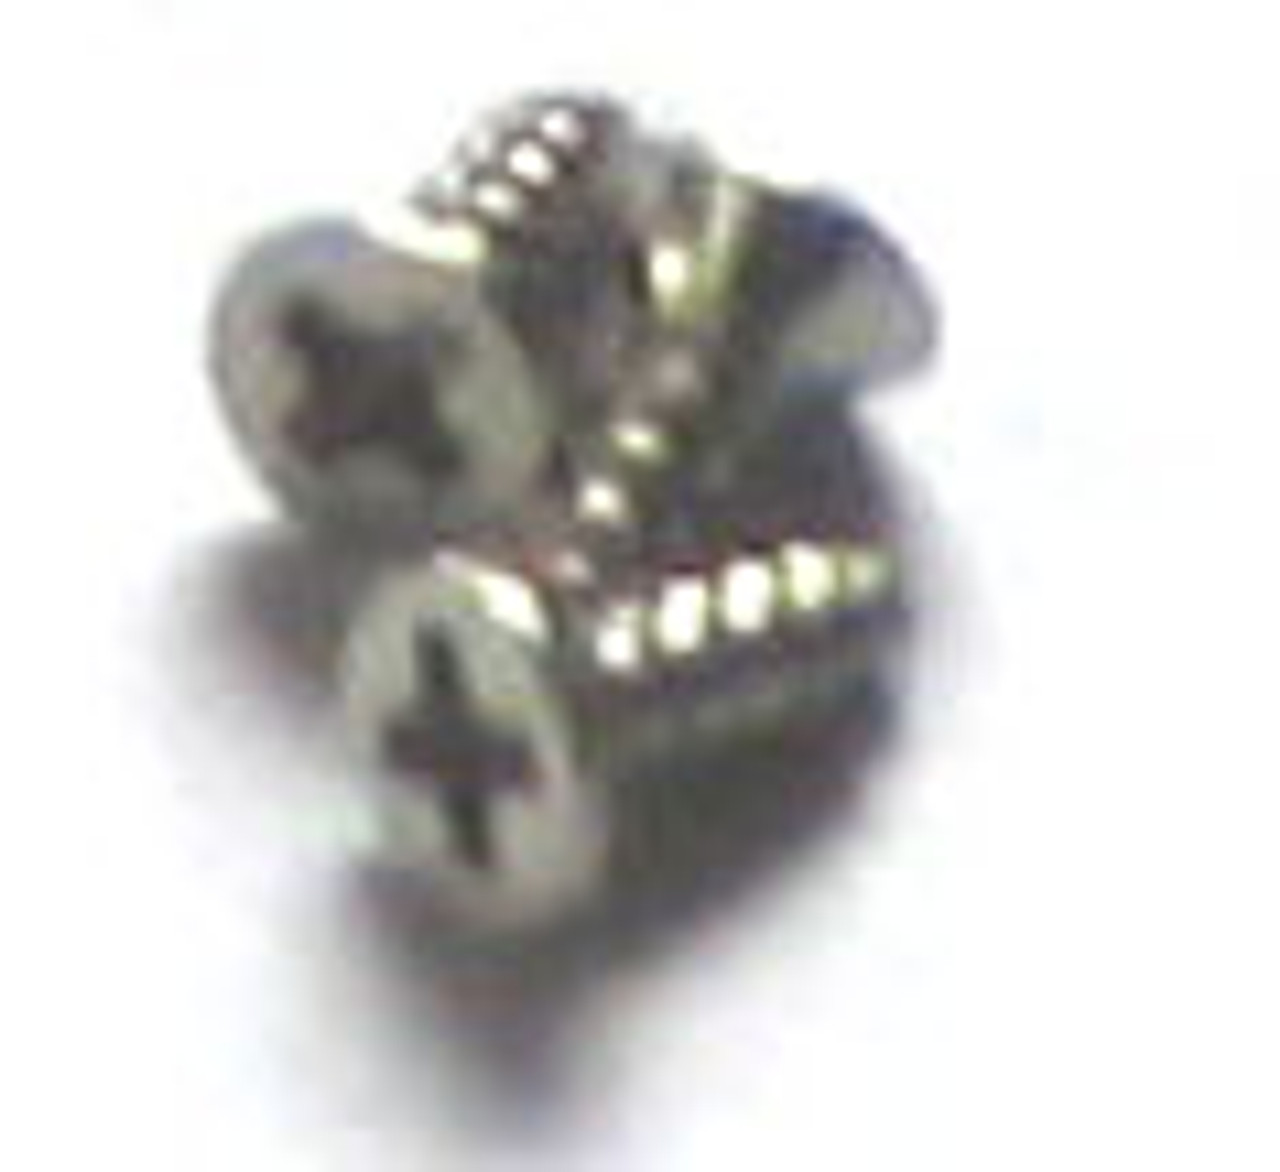 #2 Nickel Plated Phillips Flat Head Screws